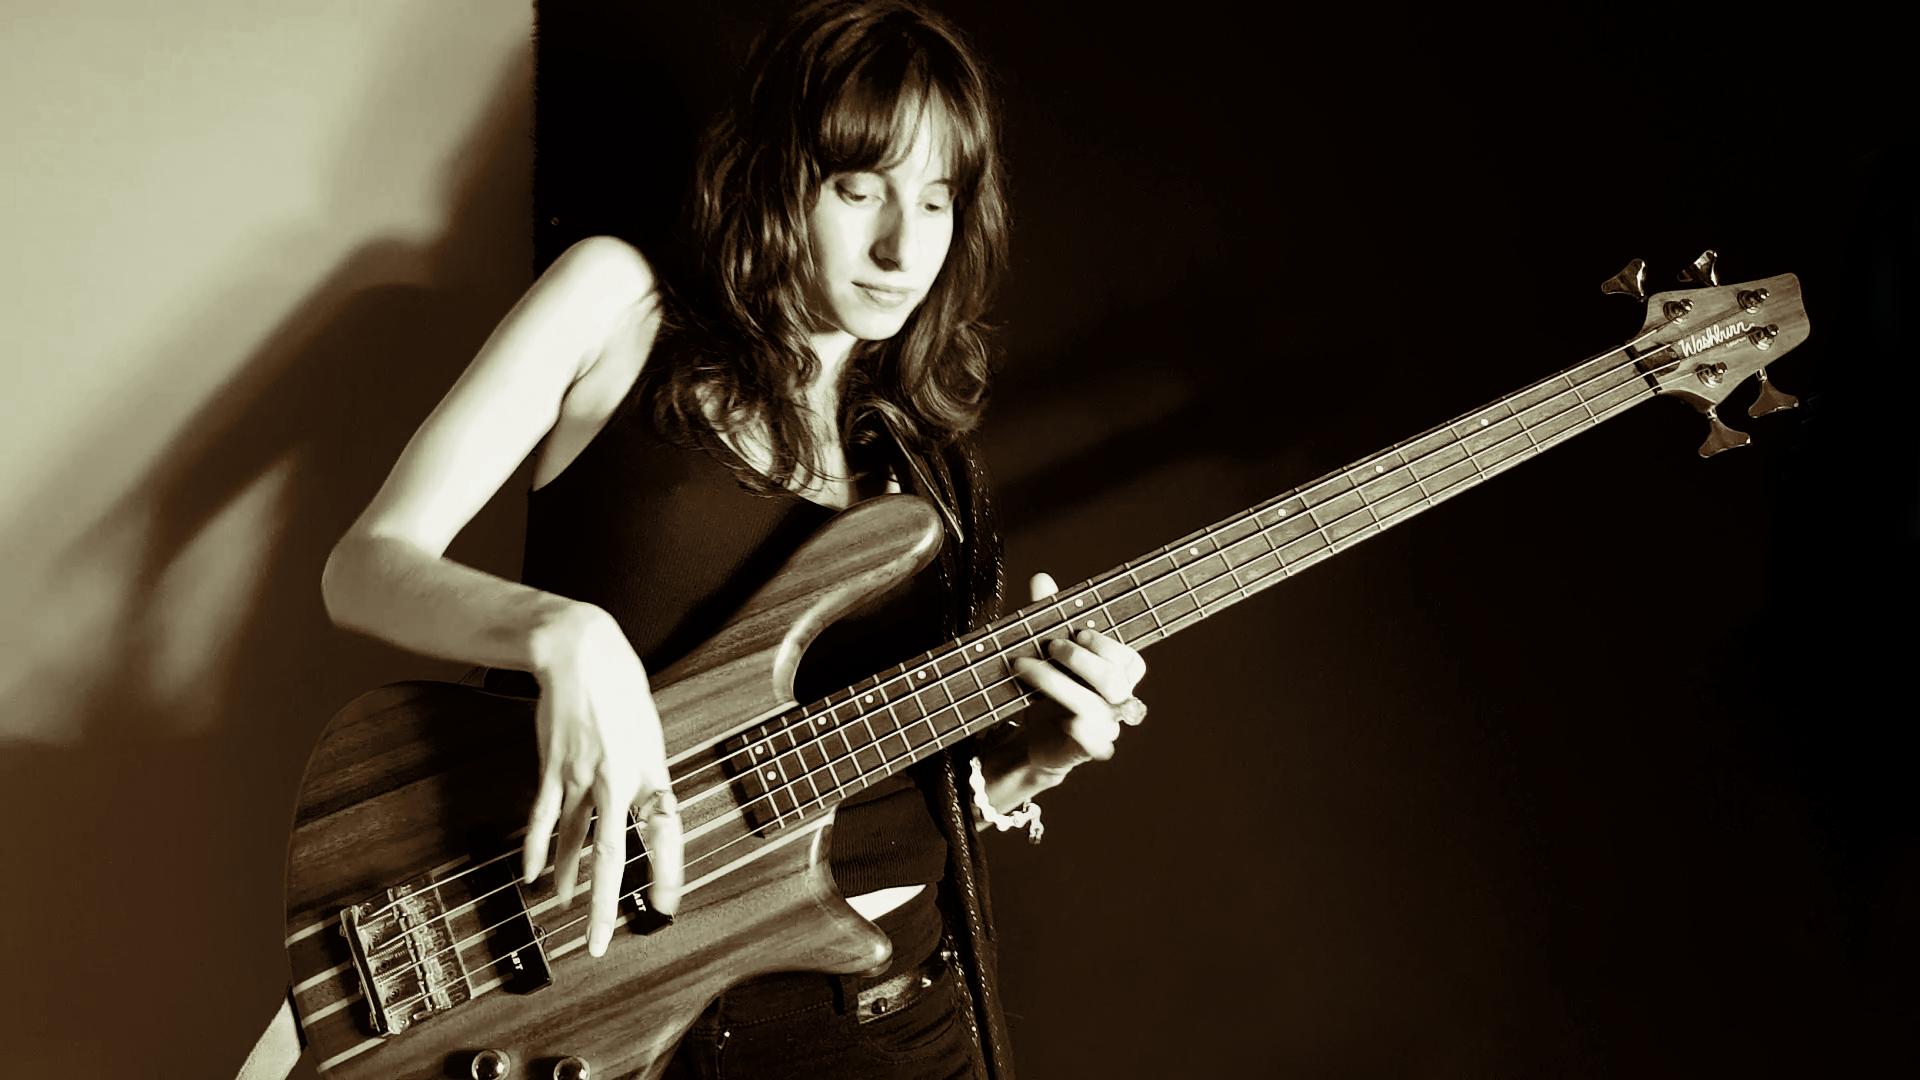 Oh, Bass Press Photo